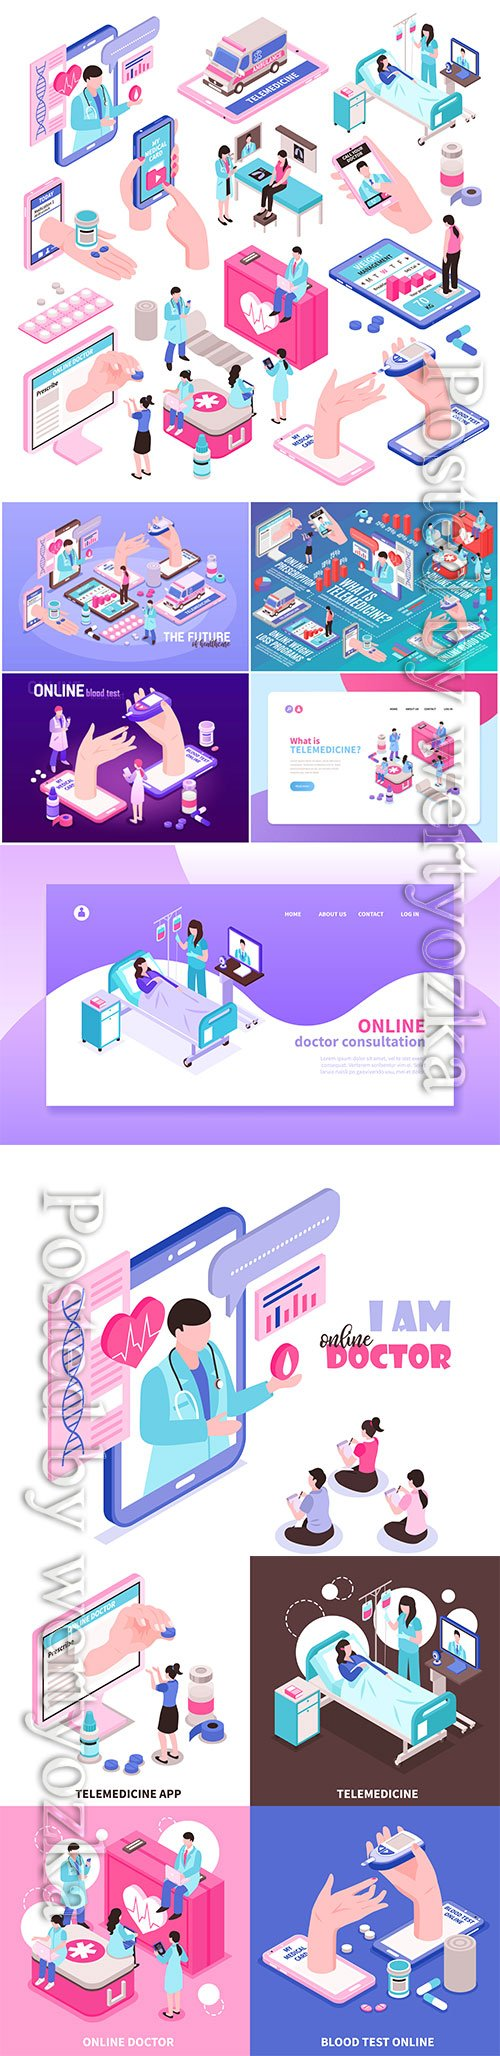 Online medicine and digital health isometric elements vector set